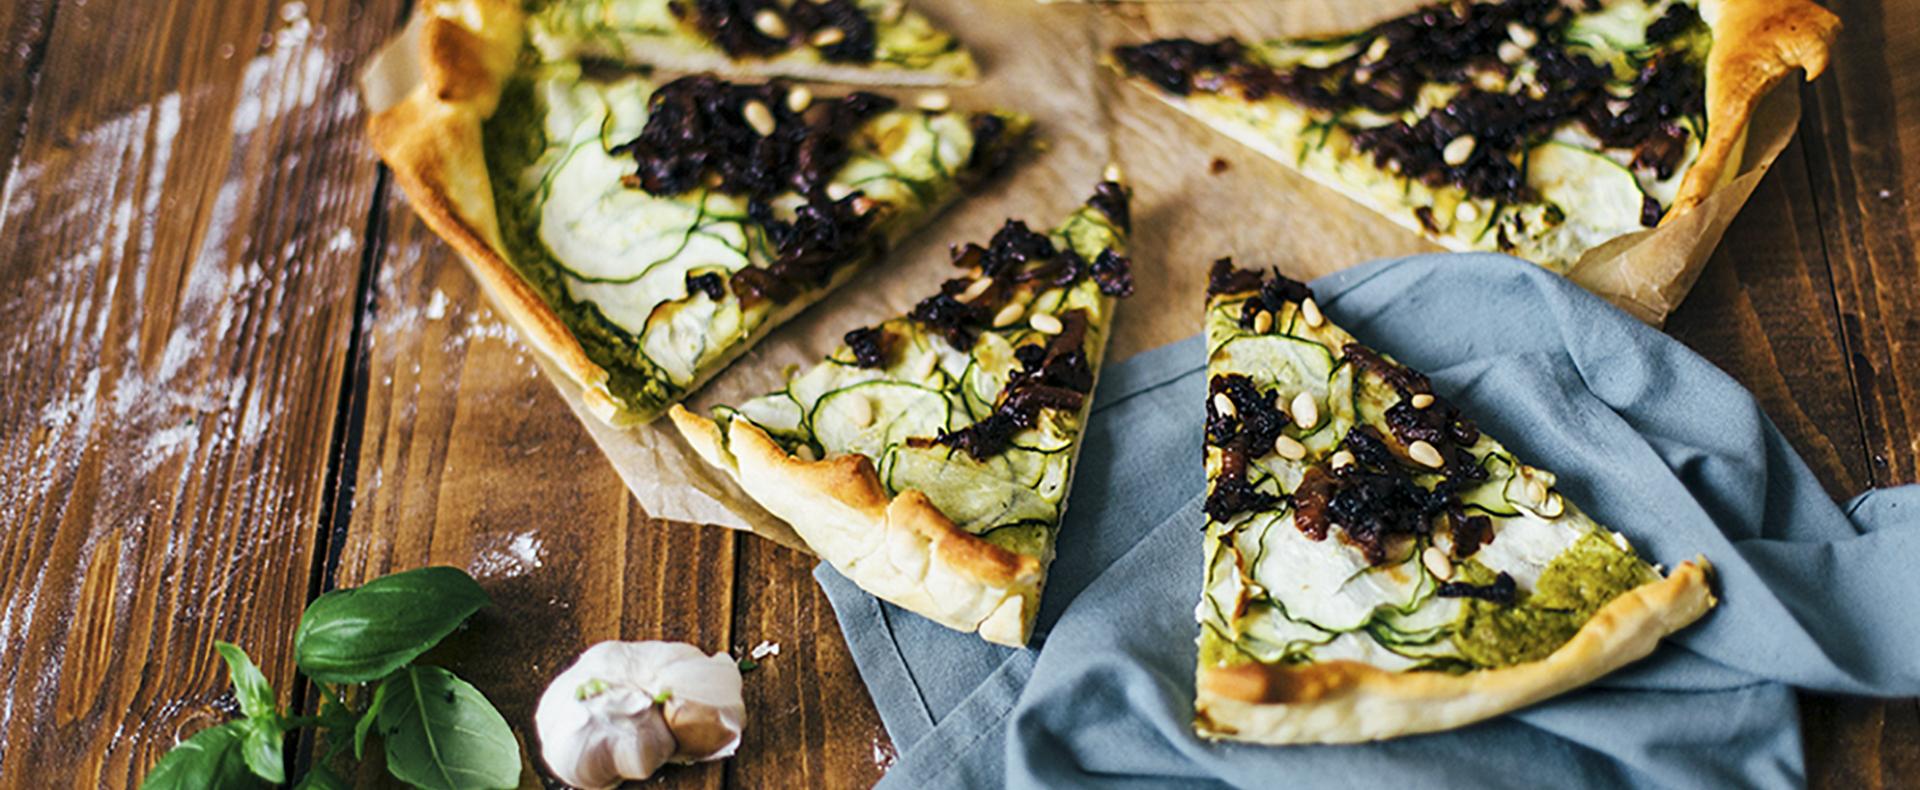 Pizza-Tante-Fanny-Door-Aline-Bouma-6